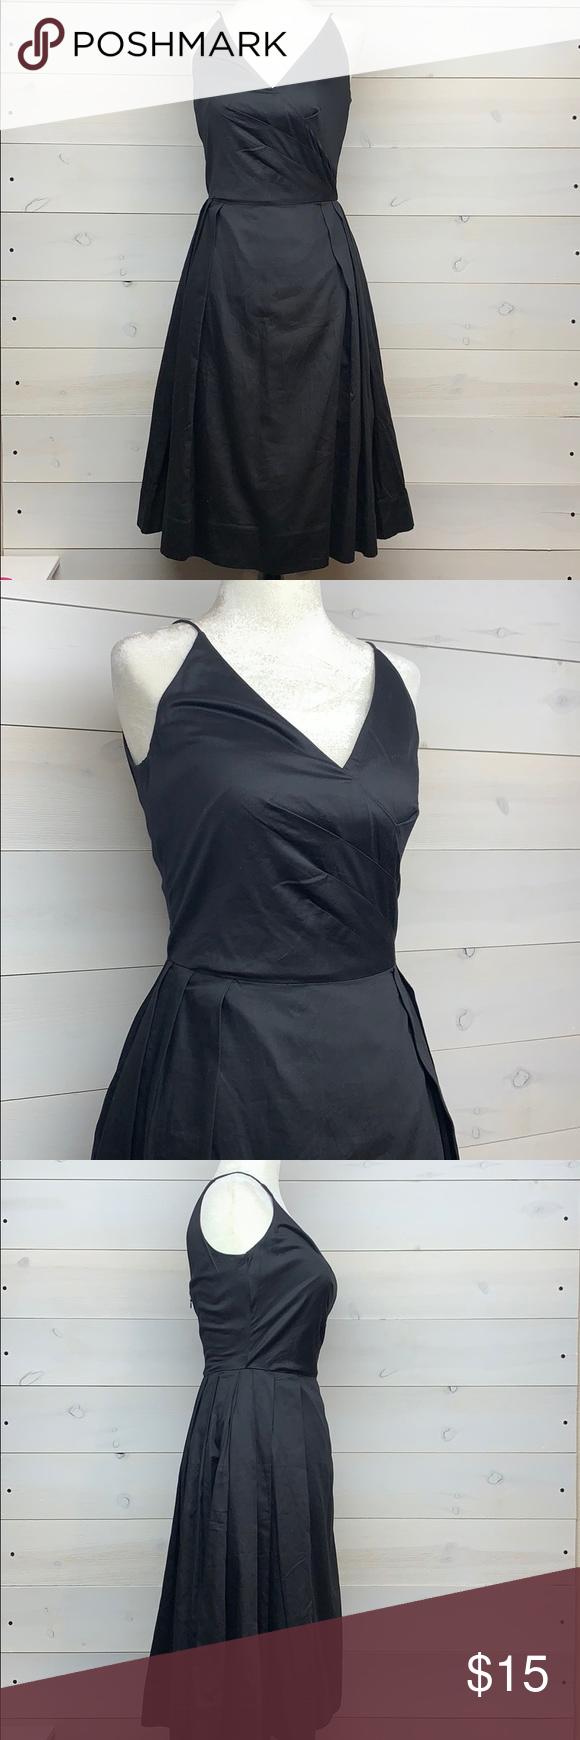 Isaac Mizrahi For Target Black Dress Black Dress Dresses Isaac Mizrahi Dress [ 1740 x 580 Pixel ]